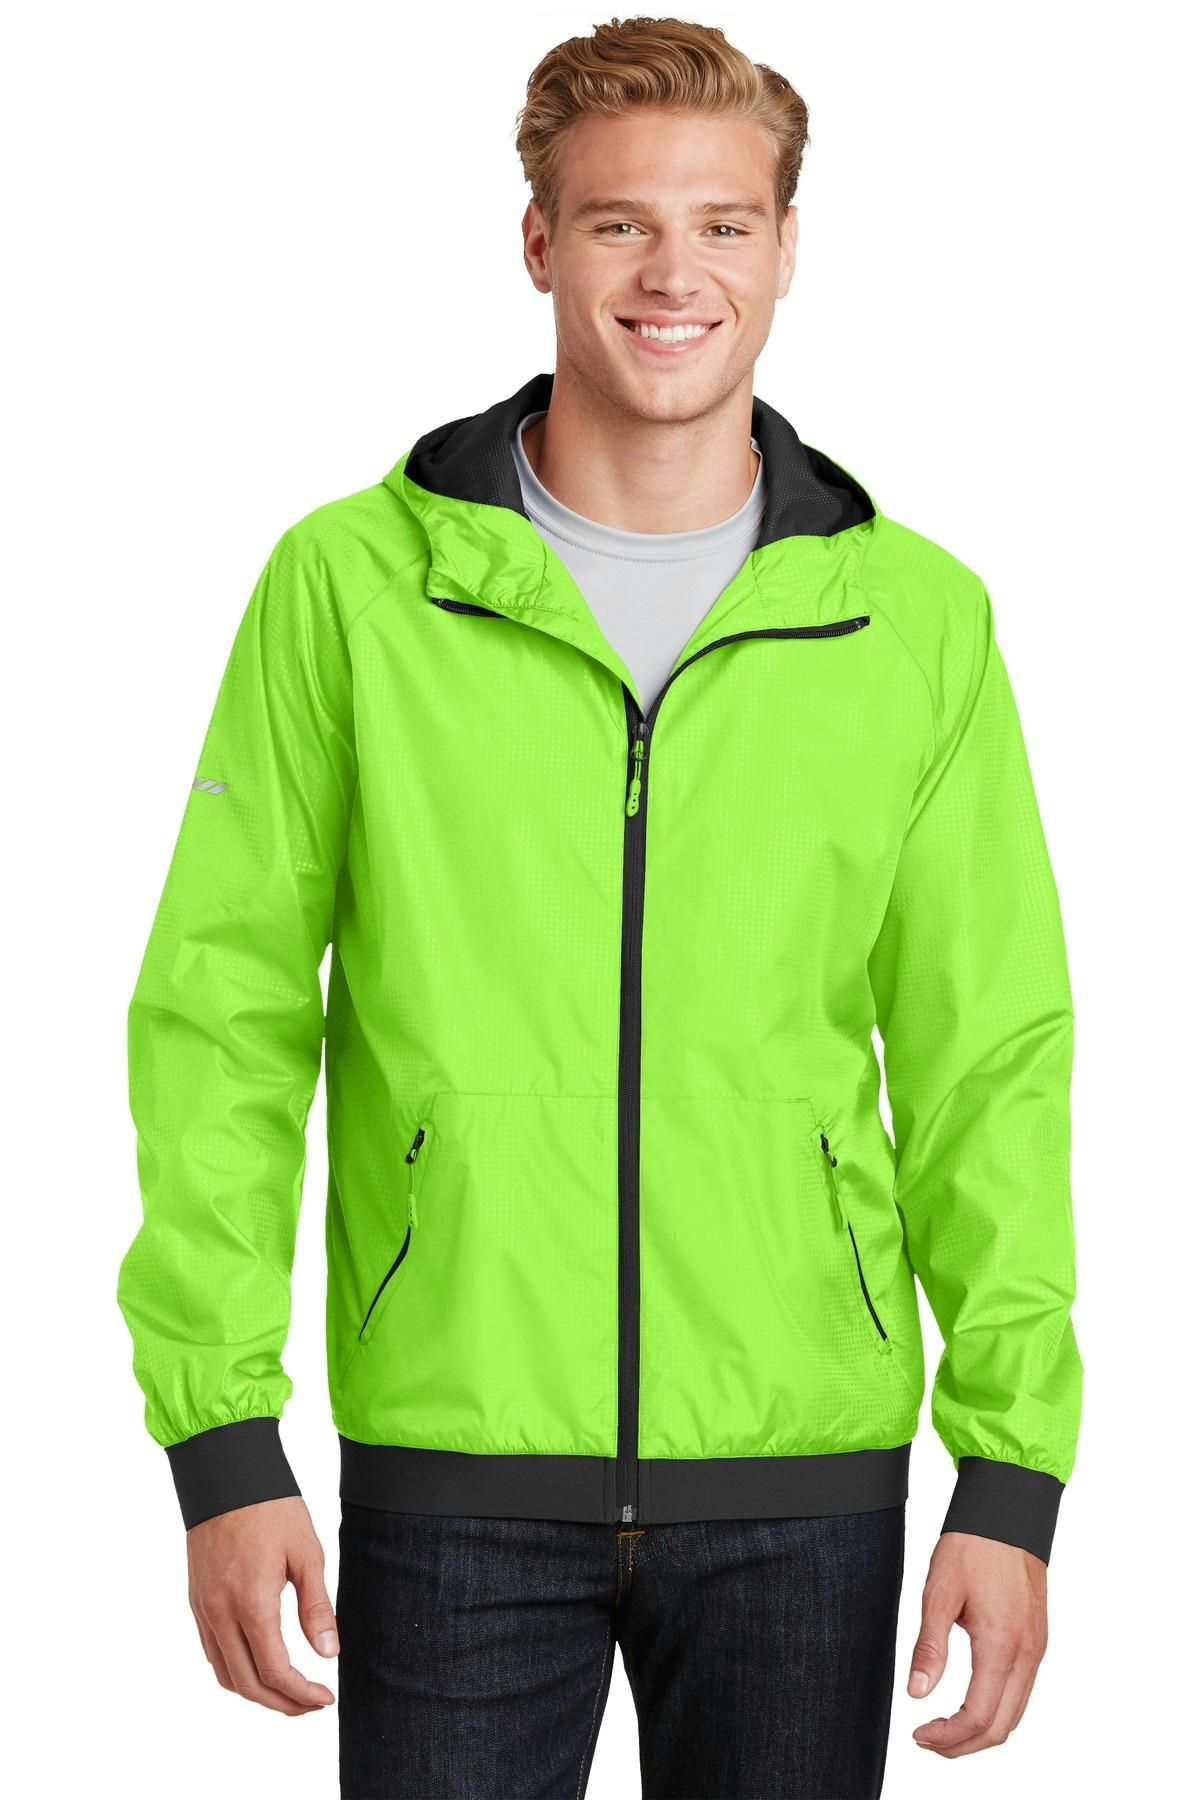 SportTek Embossed Hooded Wind Jacket. JST53 Wind jacket